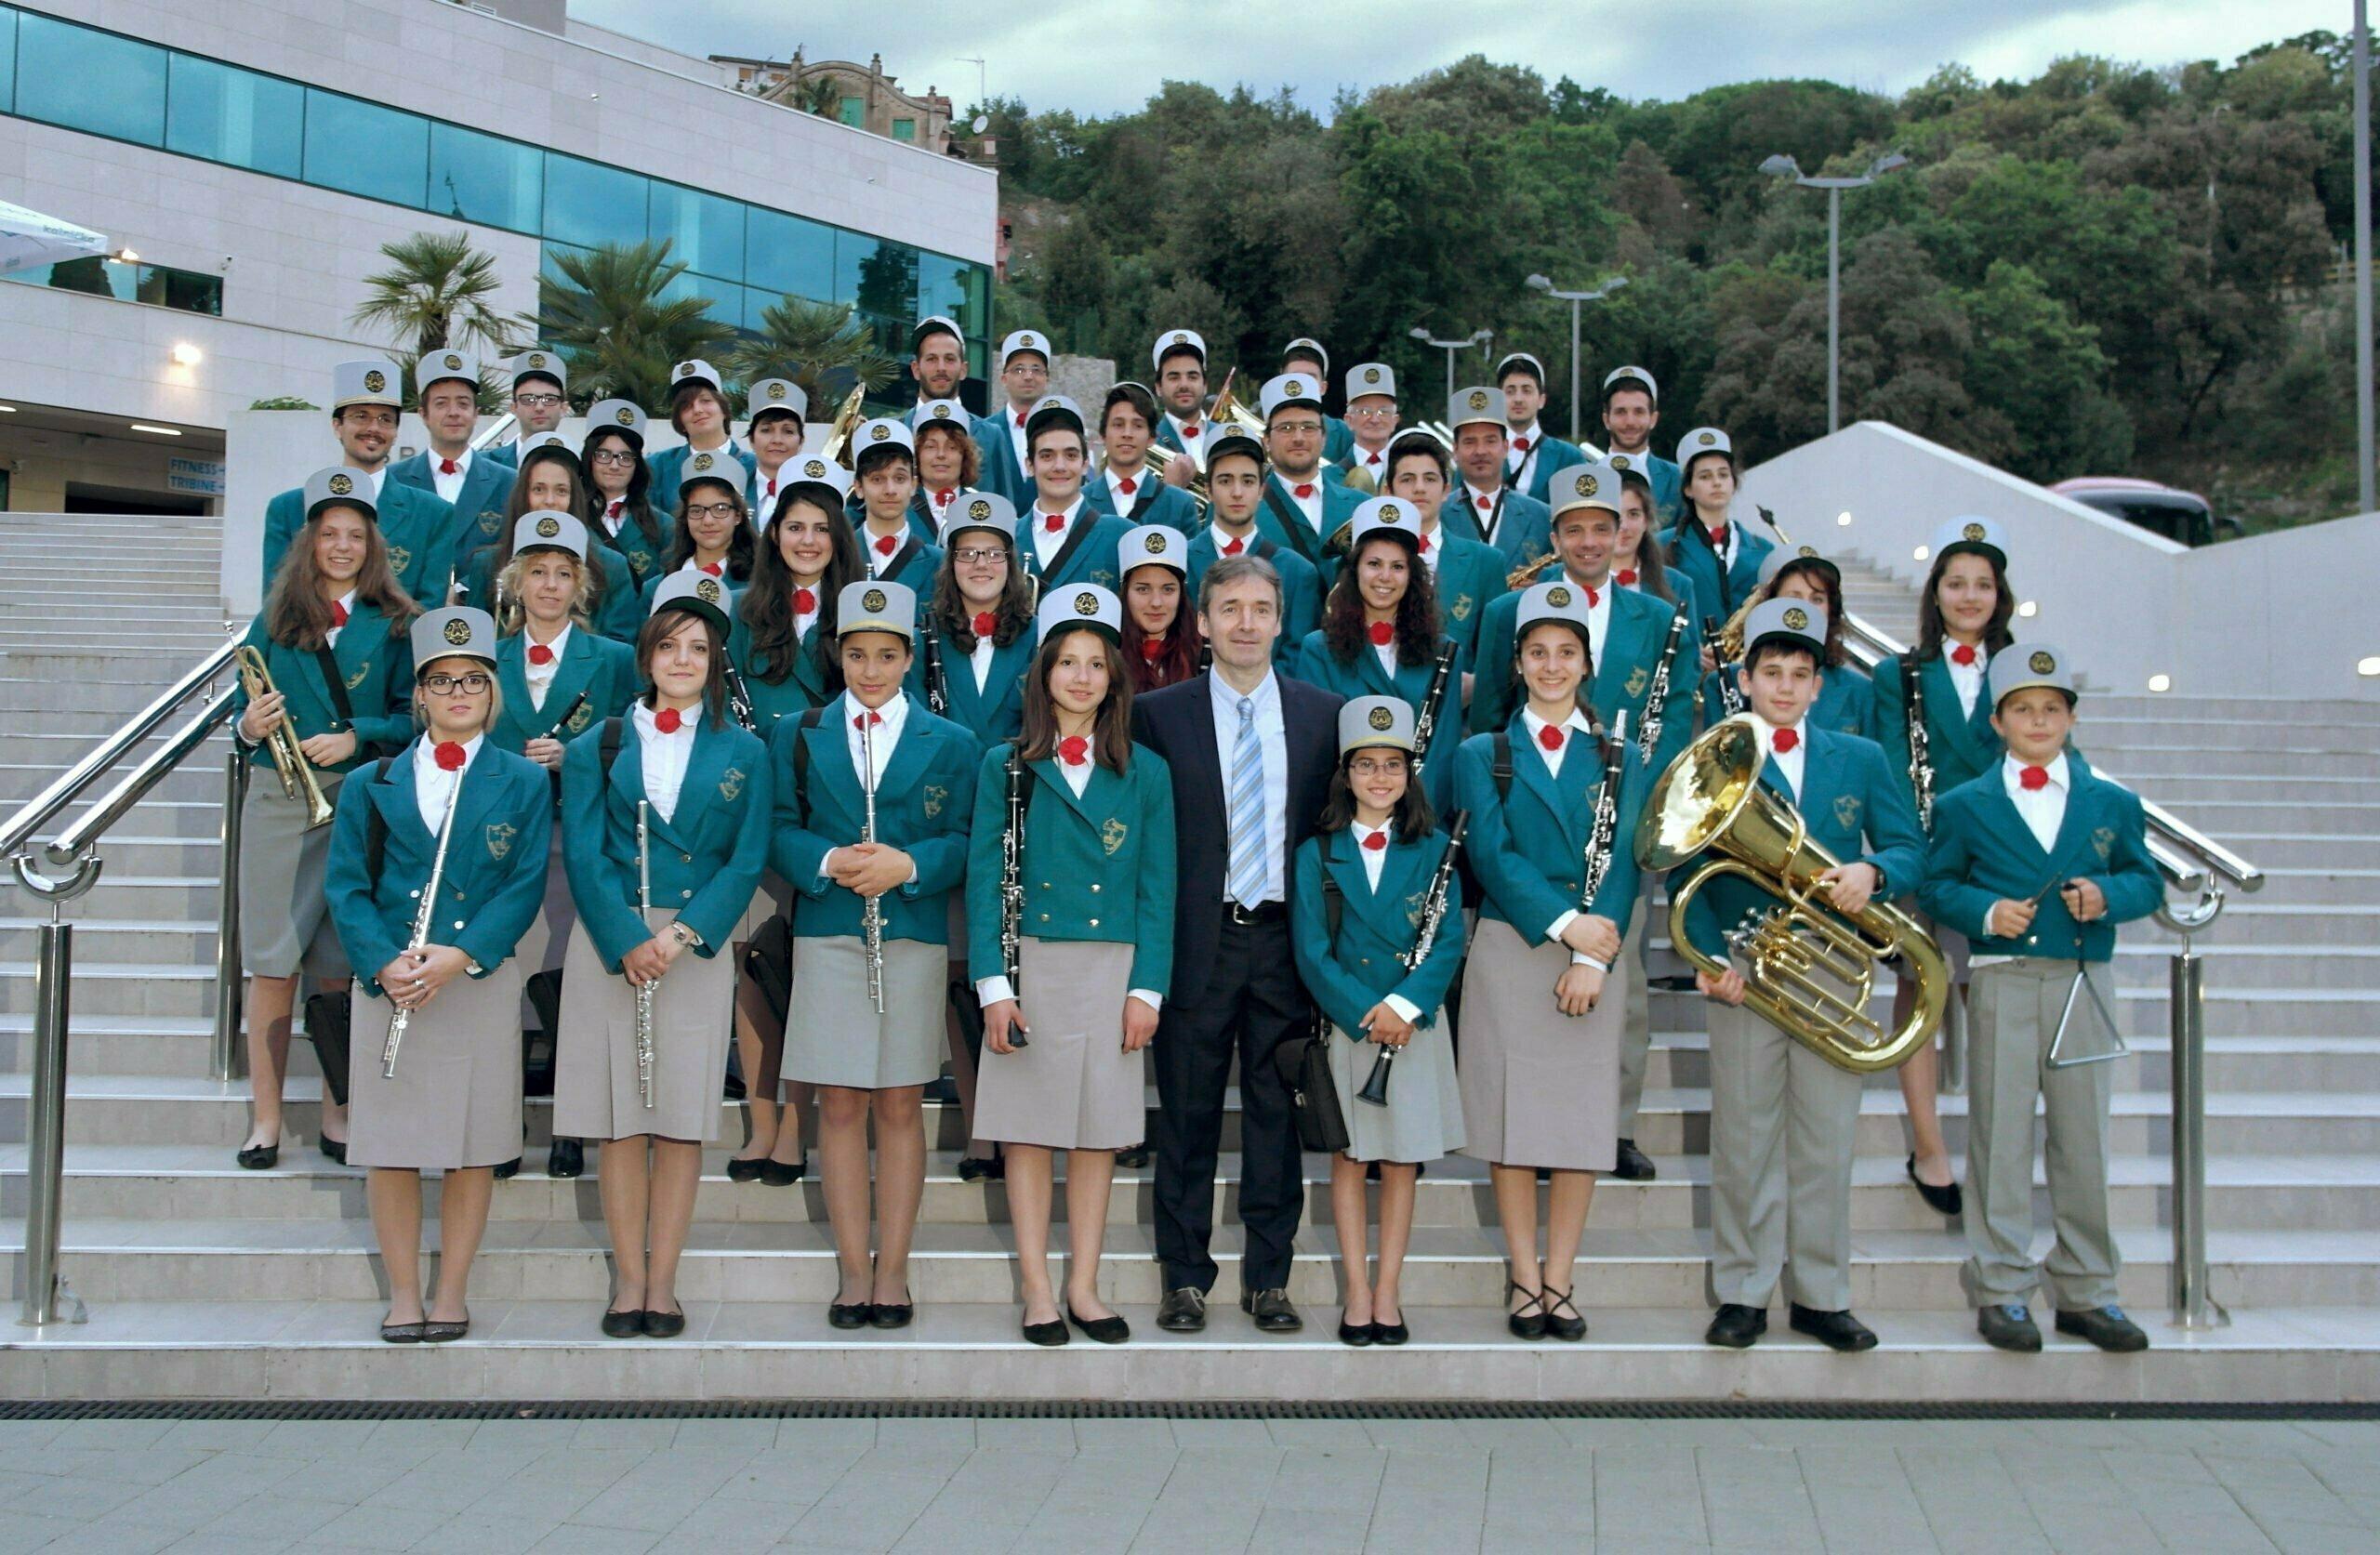 09 05 2015 concerto a Opatija banda Palazzuolo